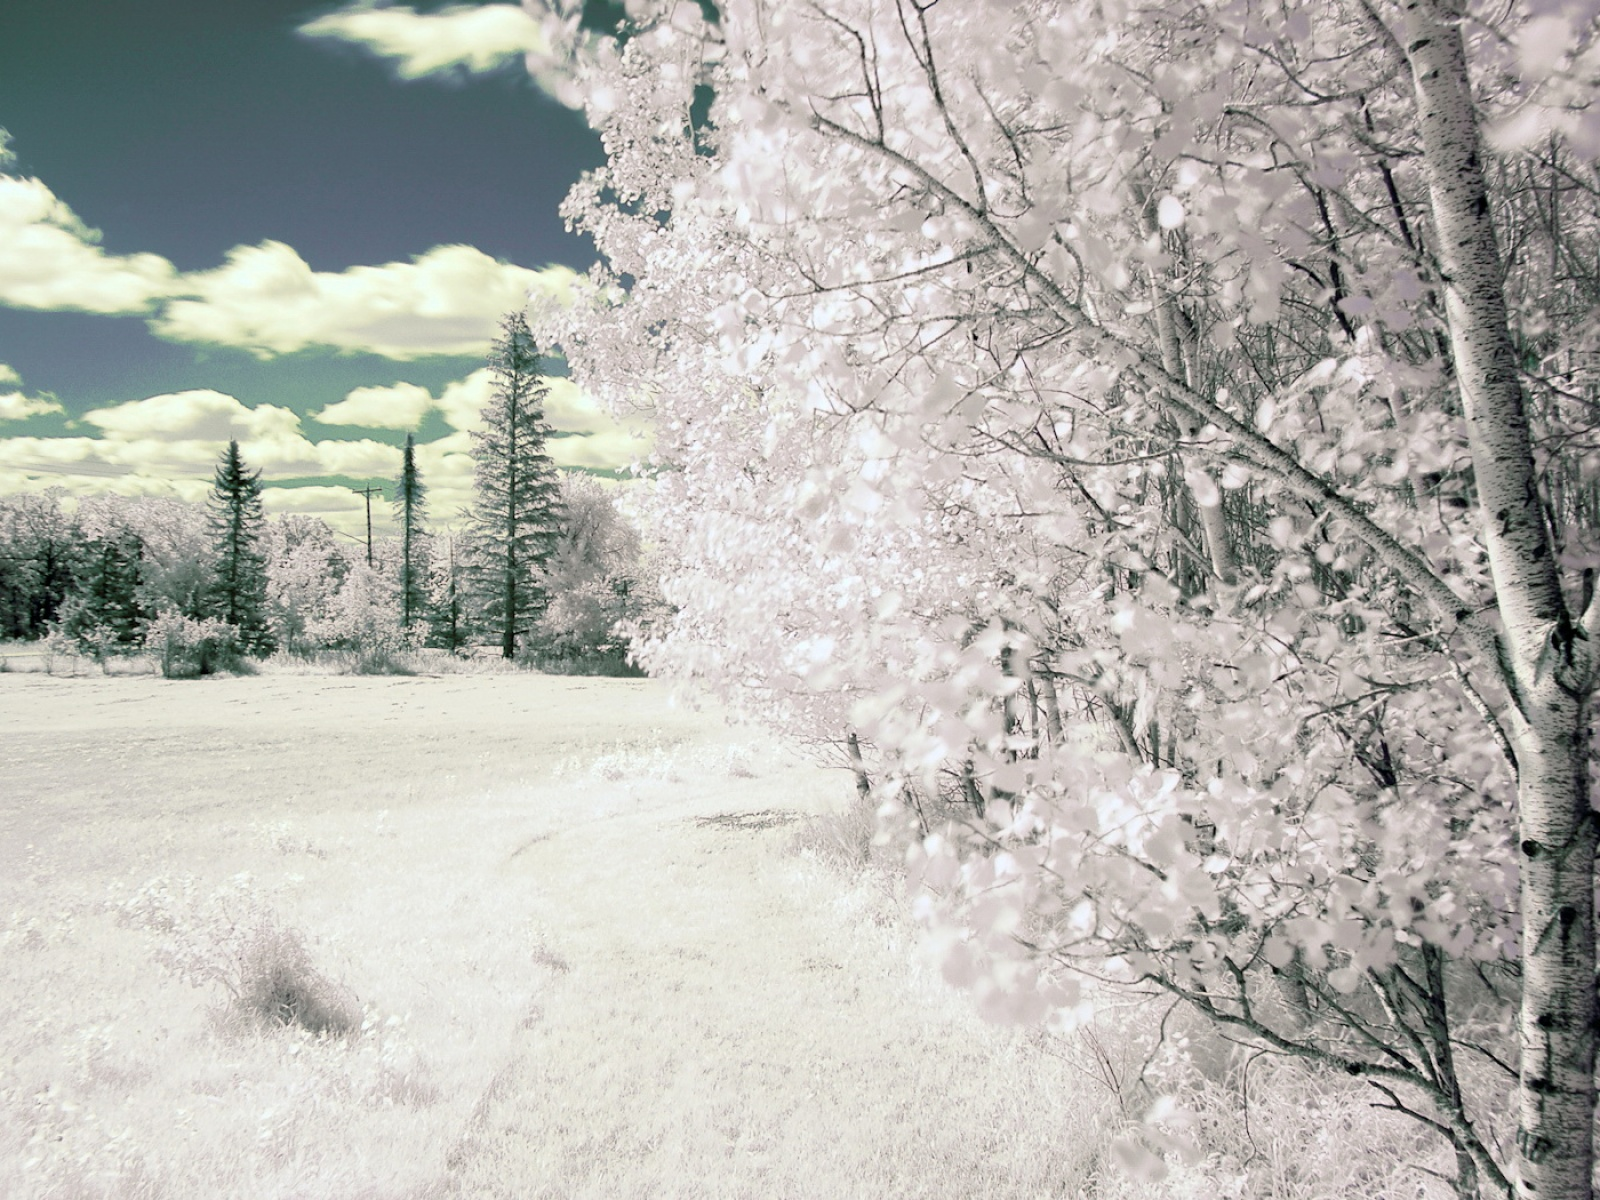 Fond d'ecran Arbre et paysage d'hiver - Wallpaper